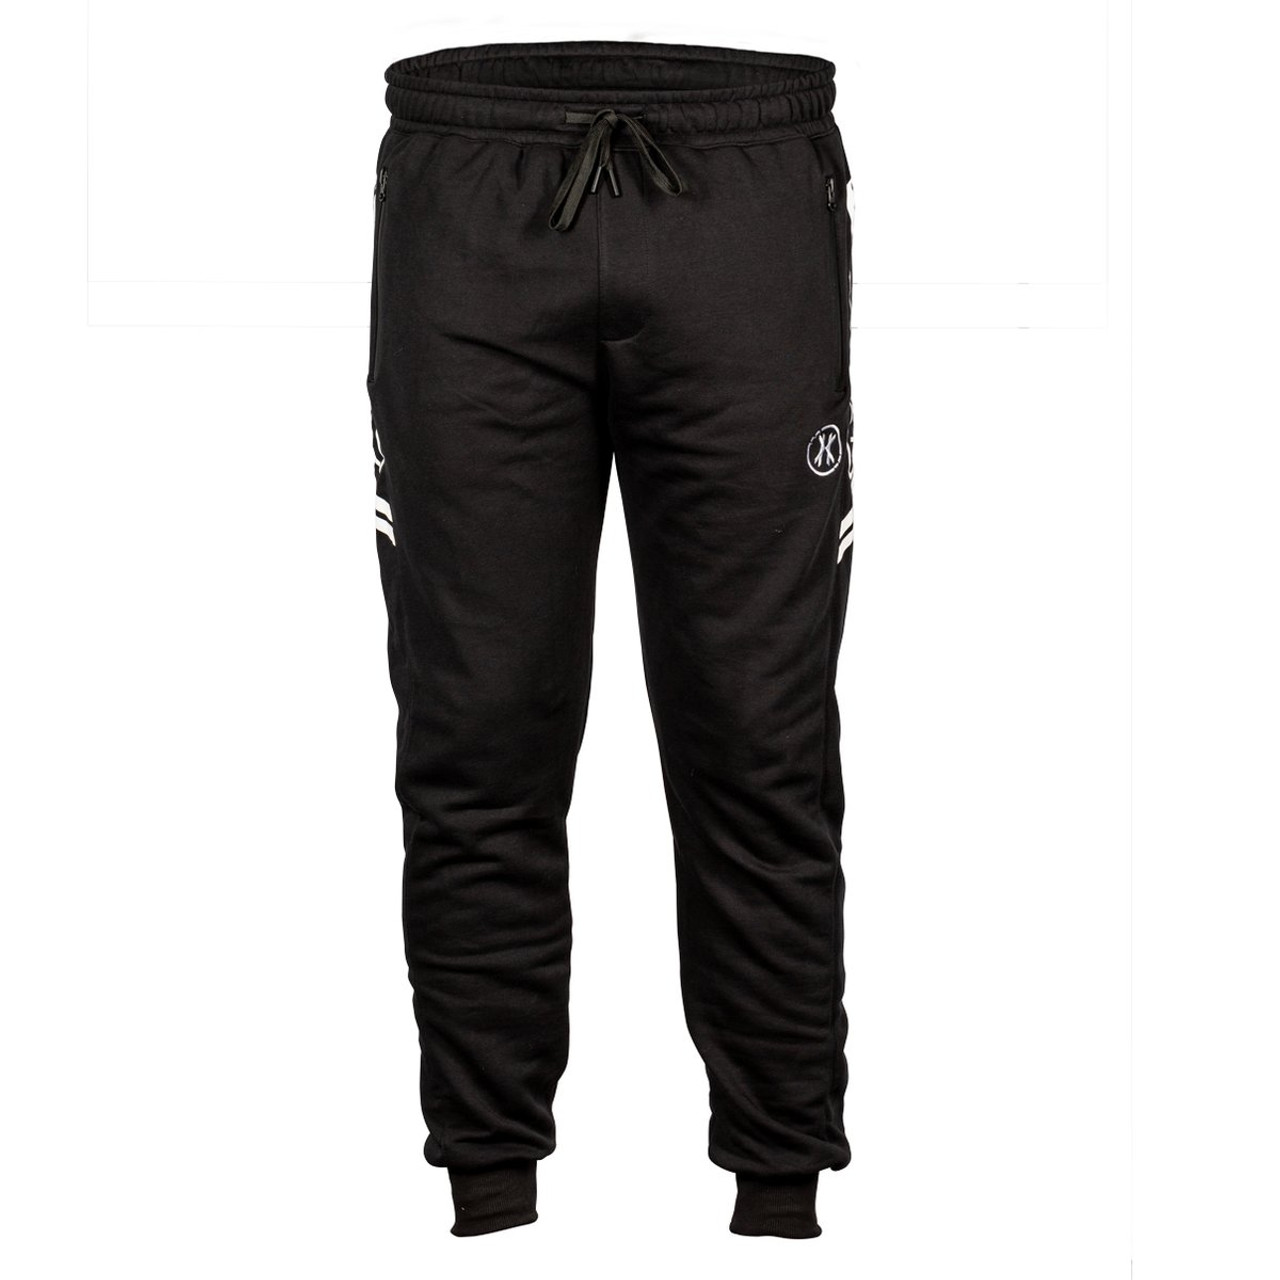 Athletex - Stride - Jogger Pants - Black